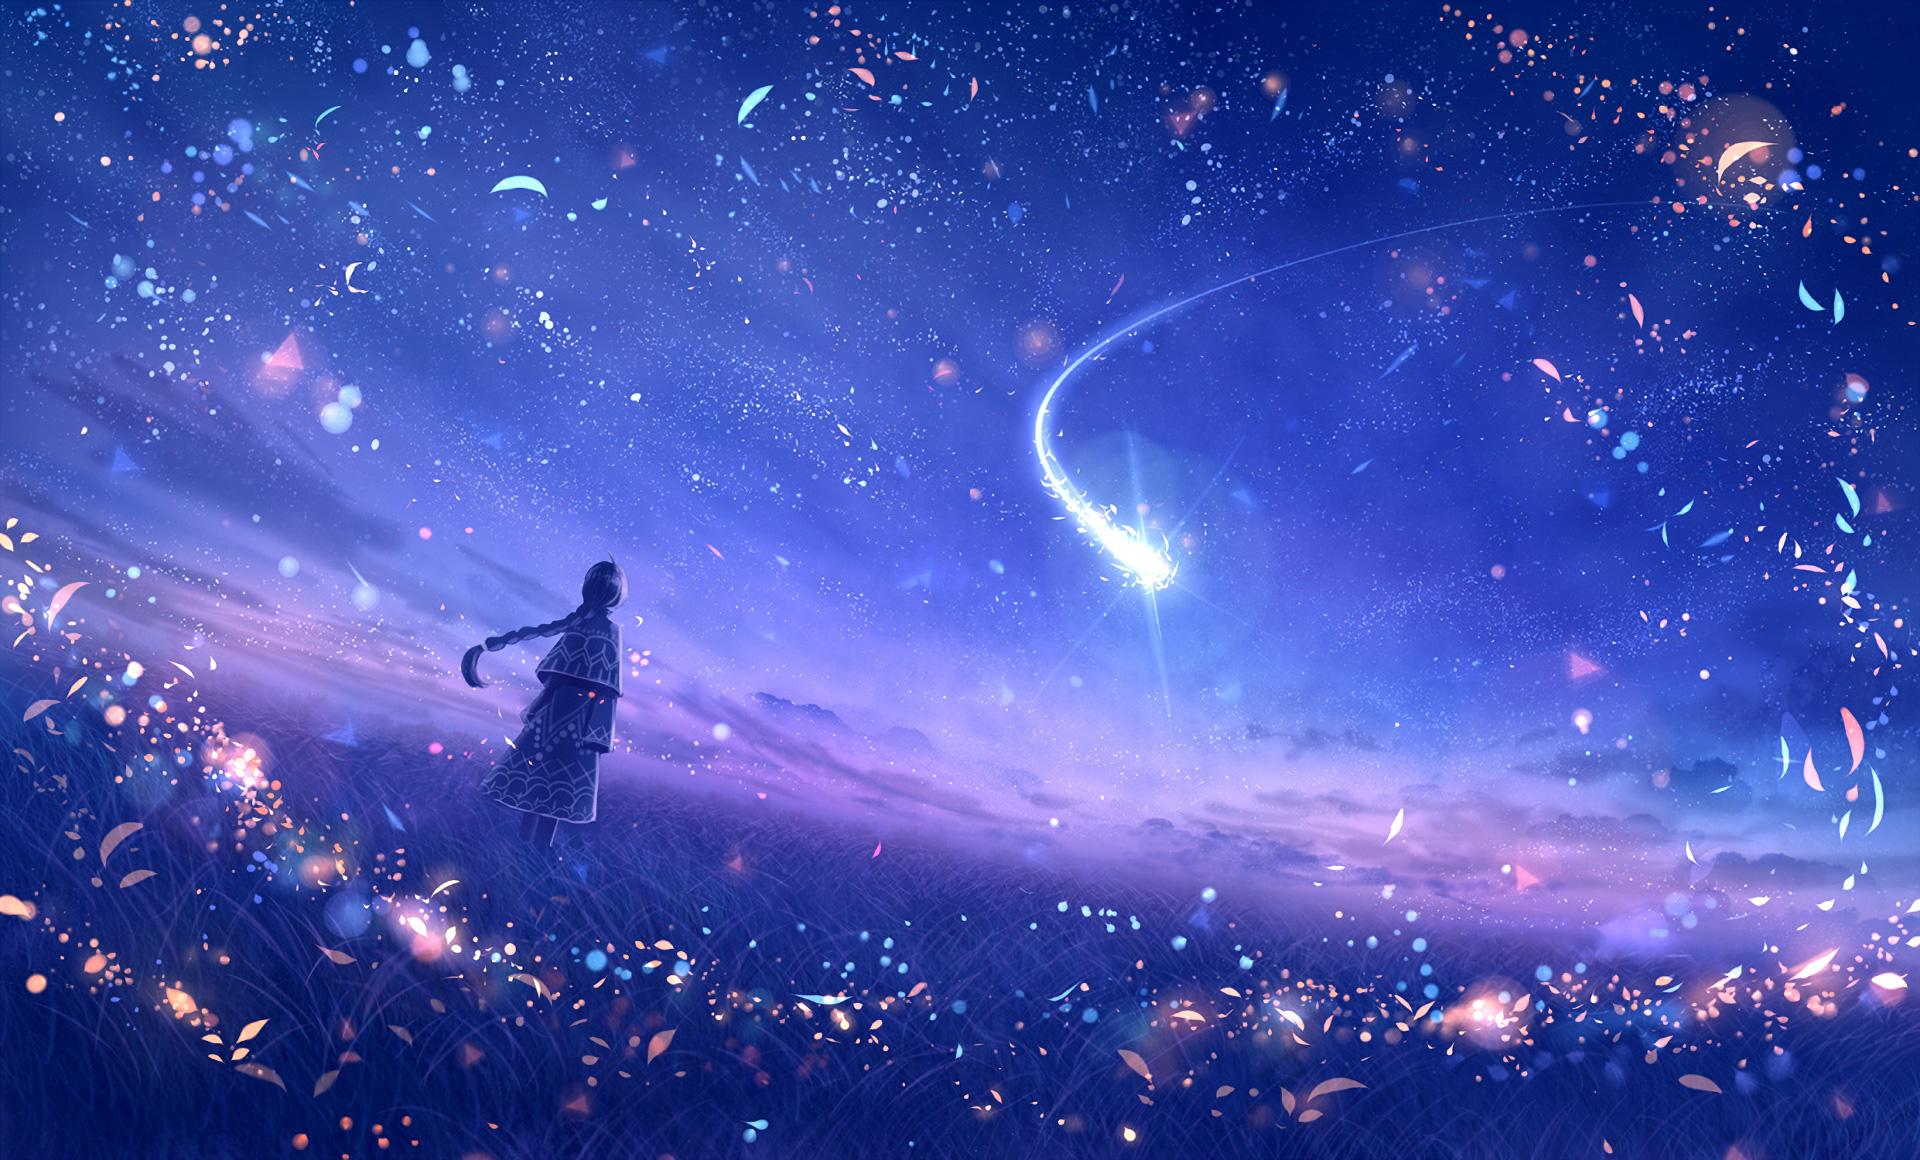 Anime 4k Wallpaper: Anime Original Dreamy Constellations Artwork, HD Anime, 4k